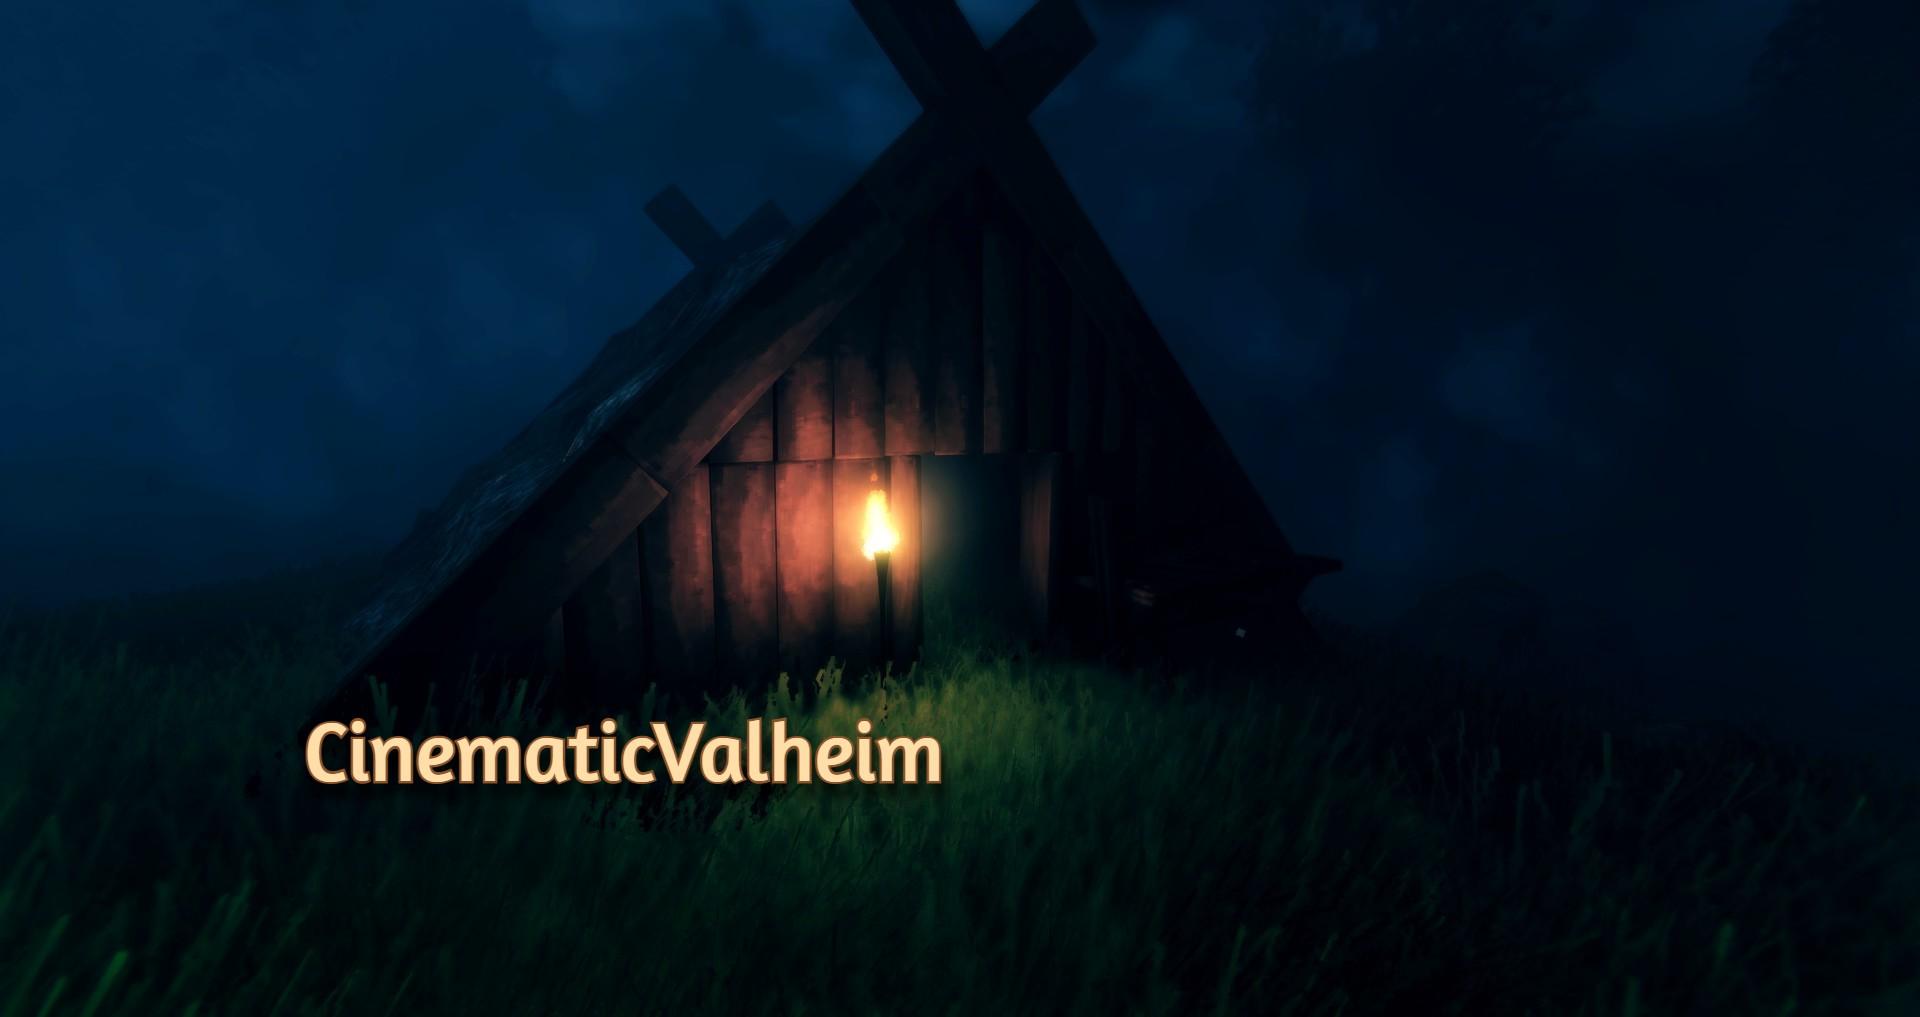 Valheim: Cinematic graphics